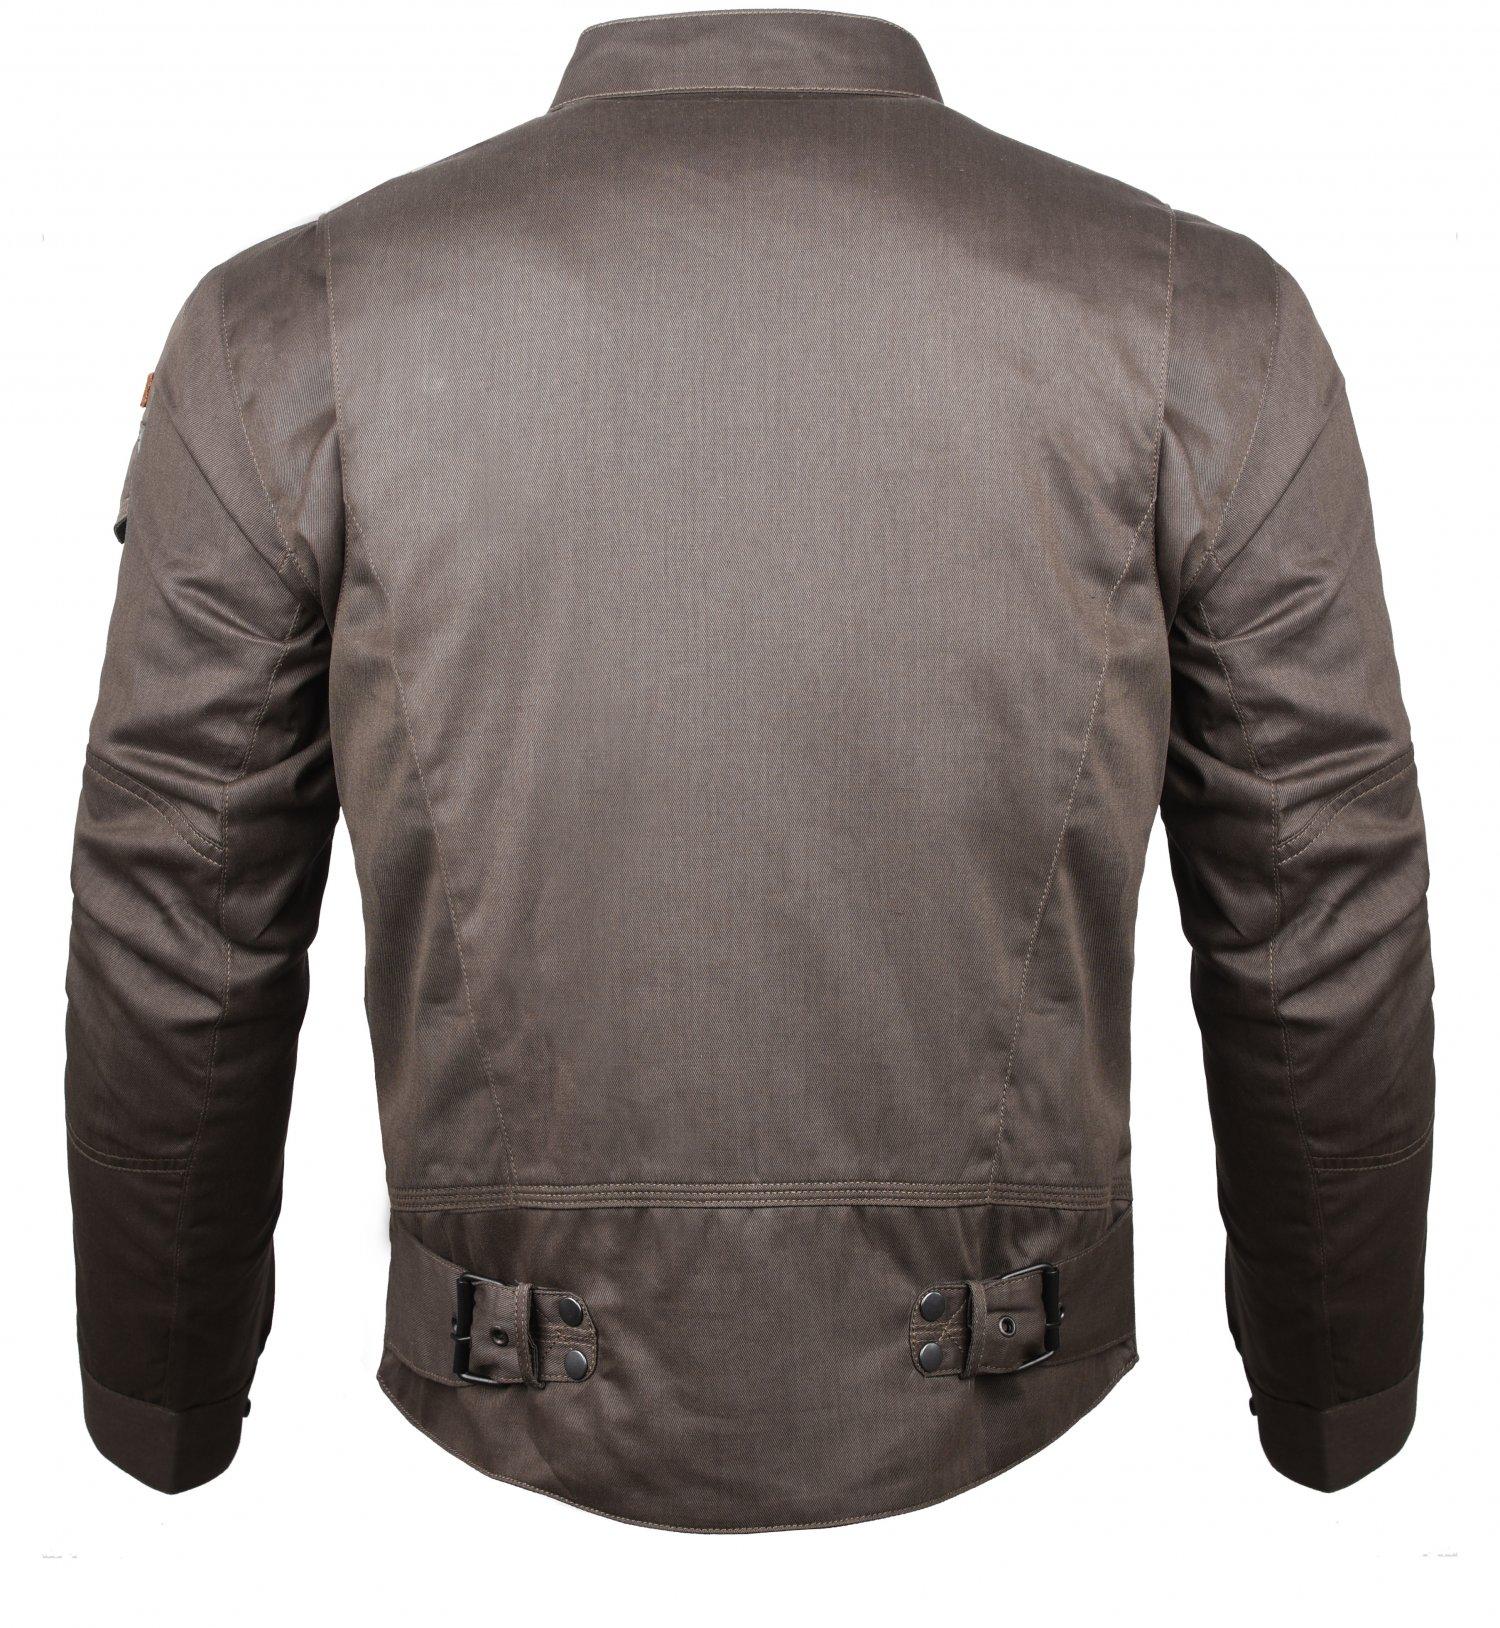 resurgence gear safest motorcycle jacket: rocker jacket